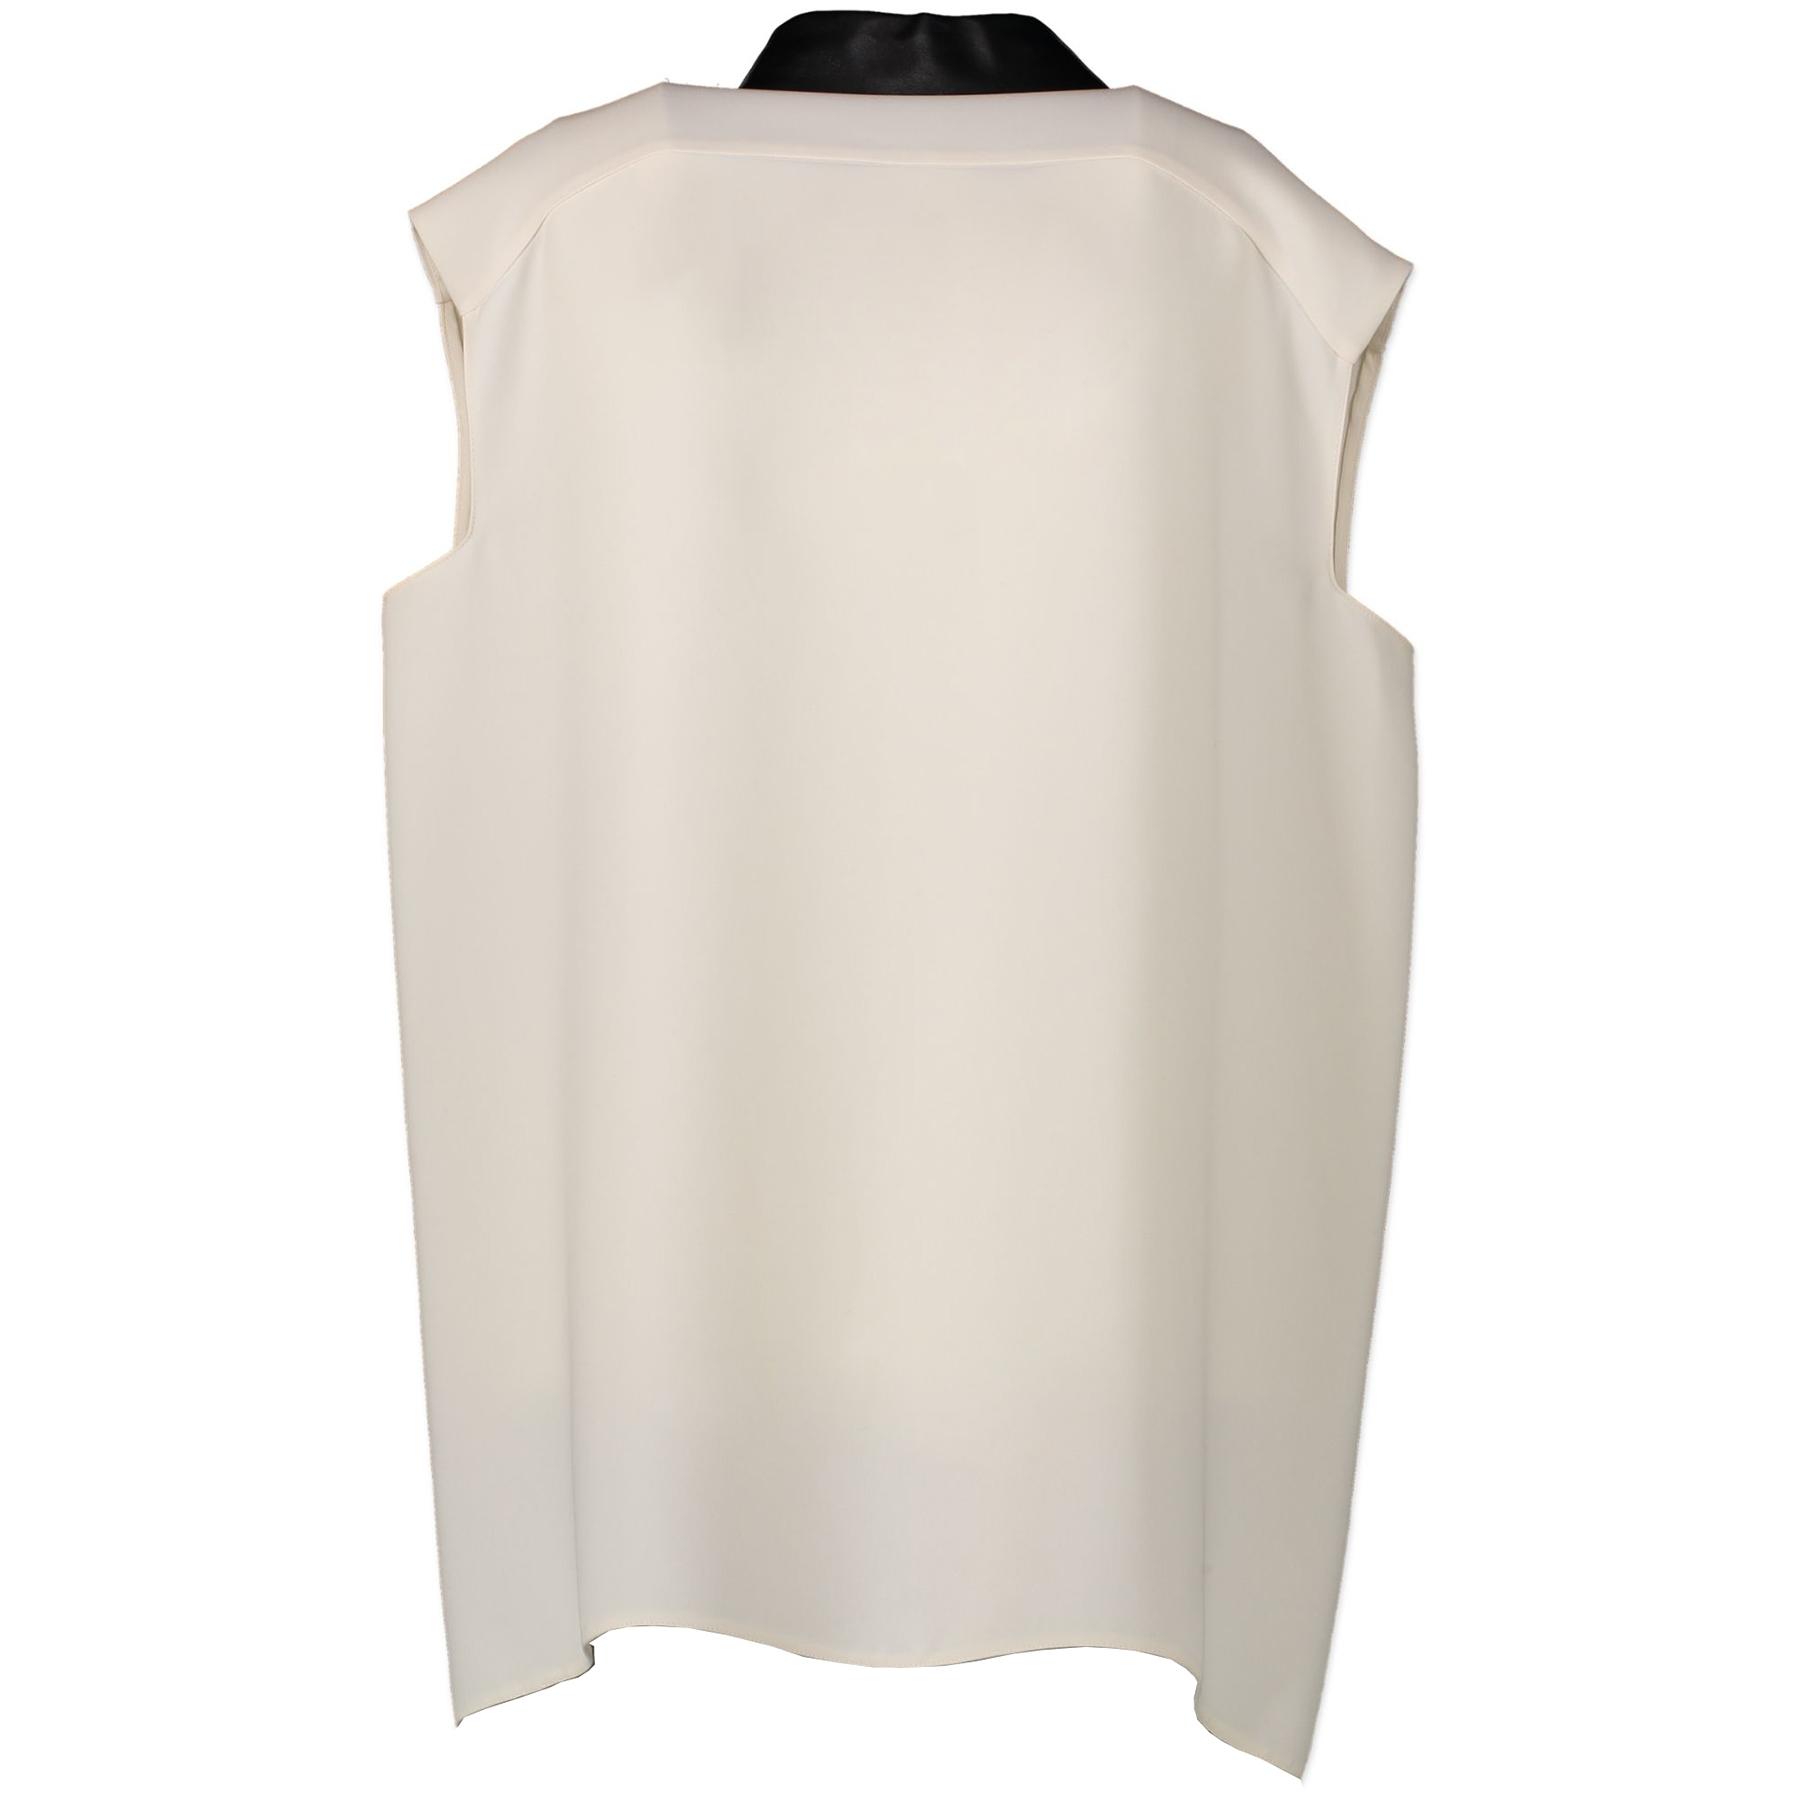 Gucci White Silk Shirt With Leather Collar - 46 IT - aan de beste prijs